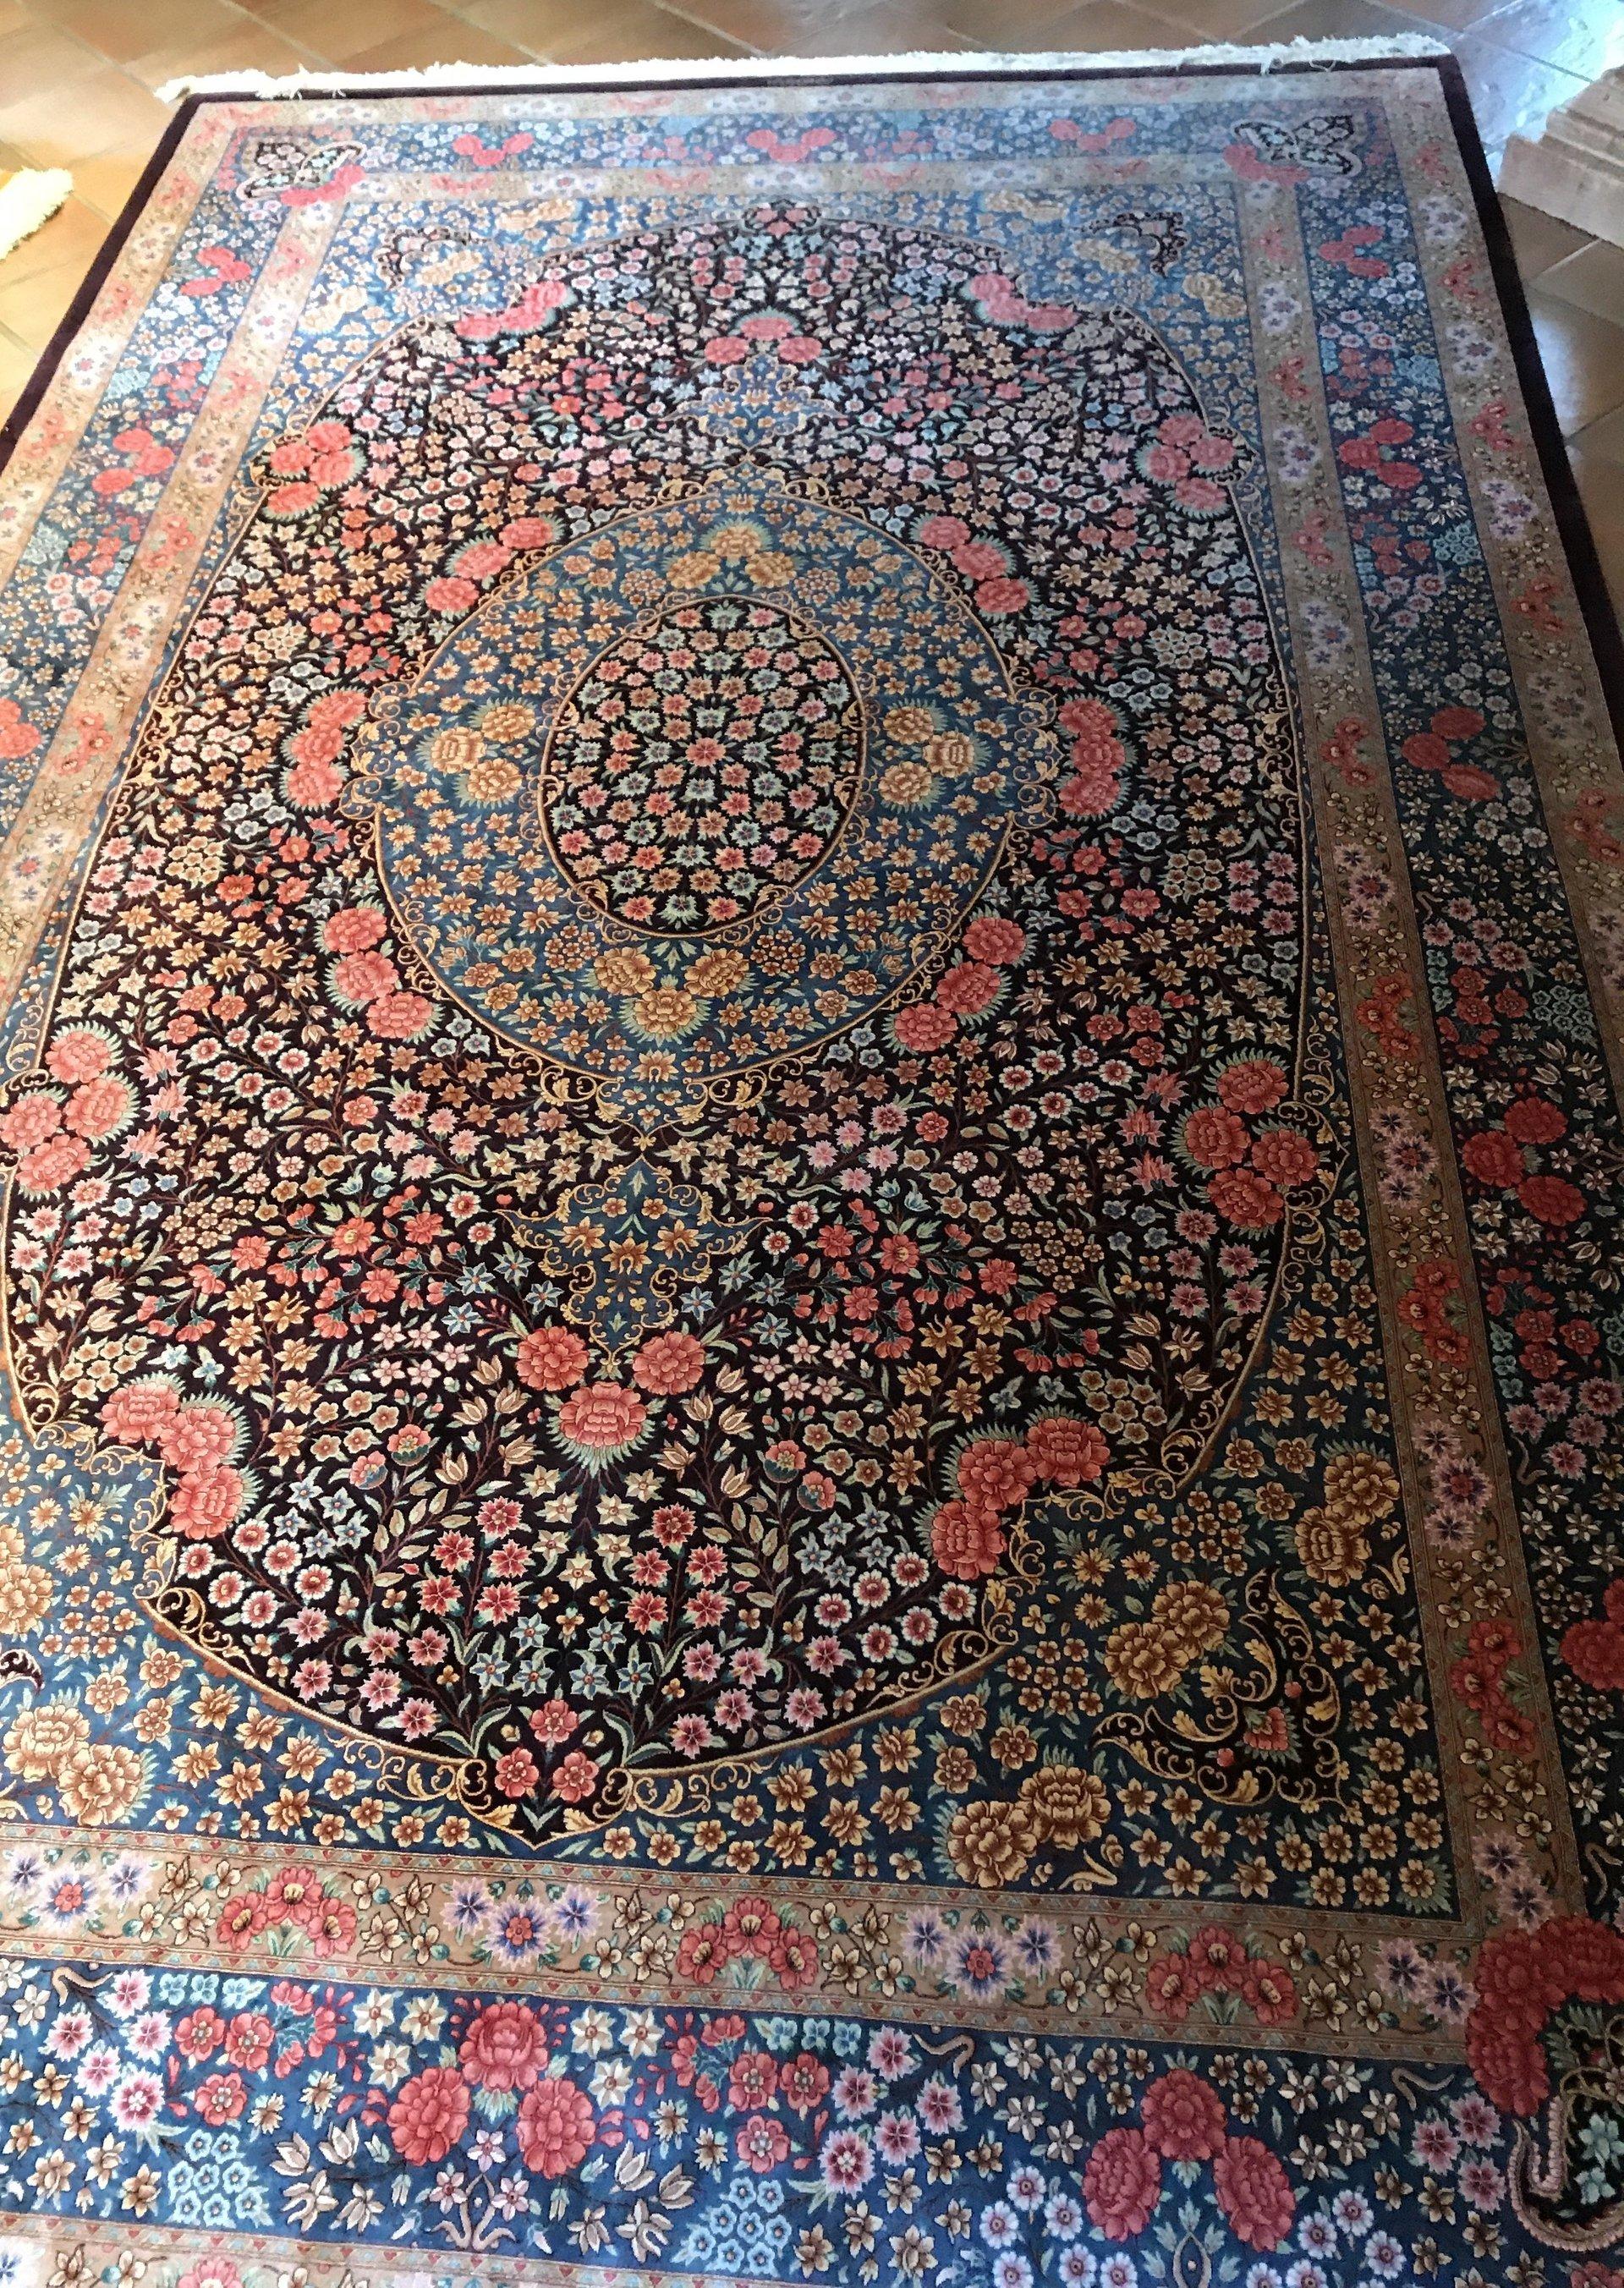 Tappeti orientali tappeti persiani yashar sesto - Tappeti orientali ...